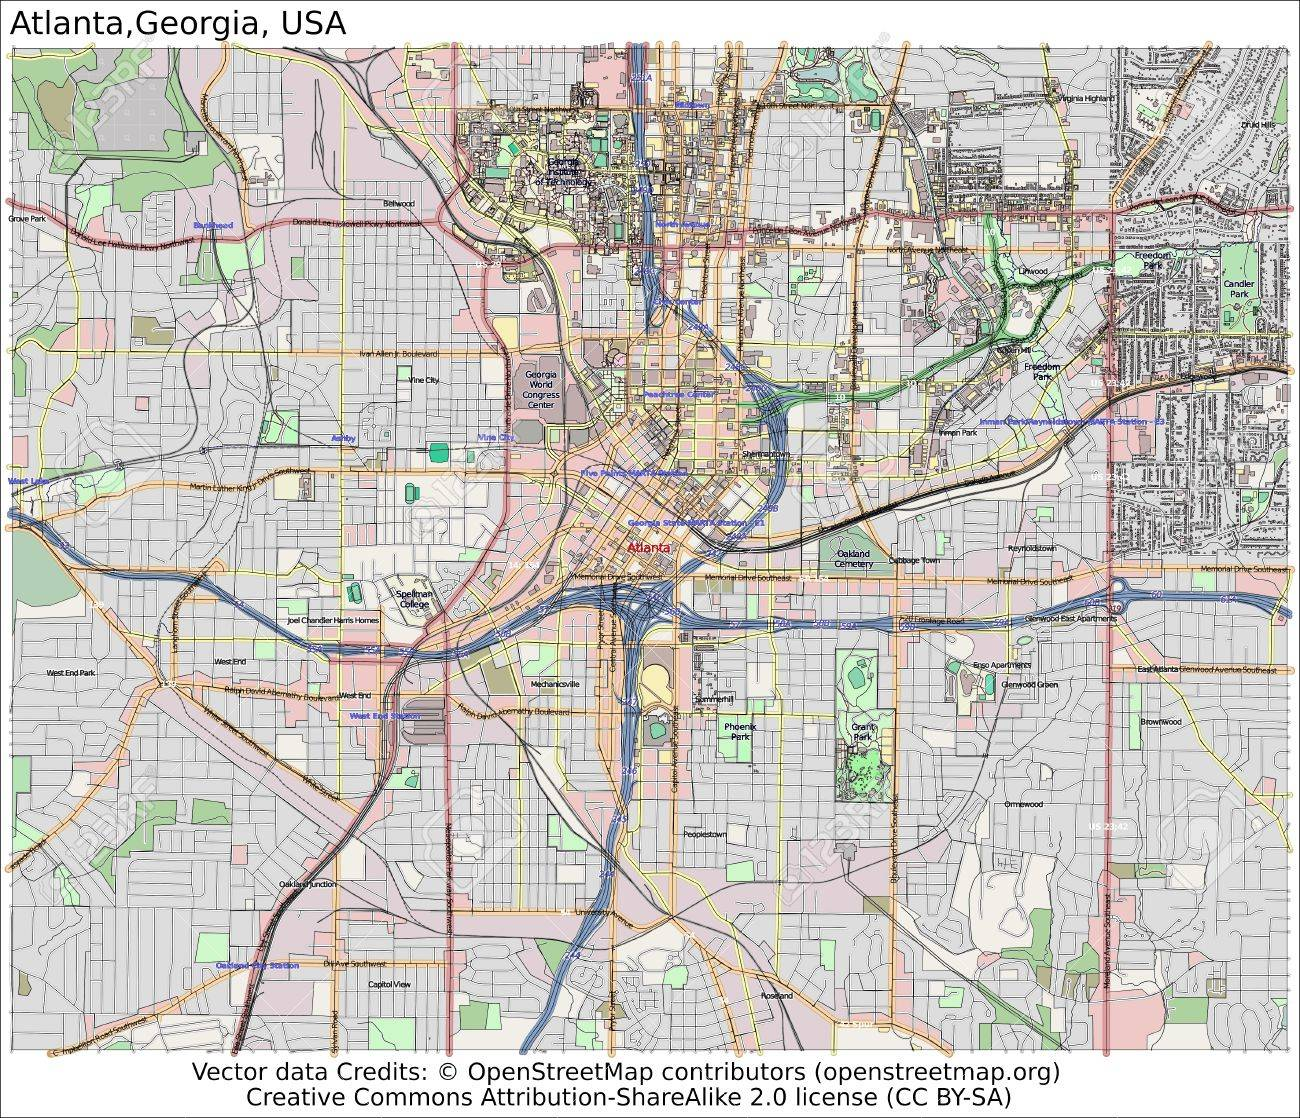 Map Of Georgia Usa With Cities.Atlanta Georgia Usa City Map Aerial View